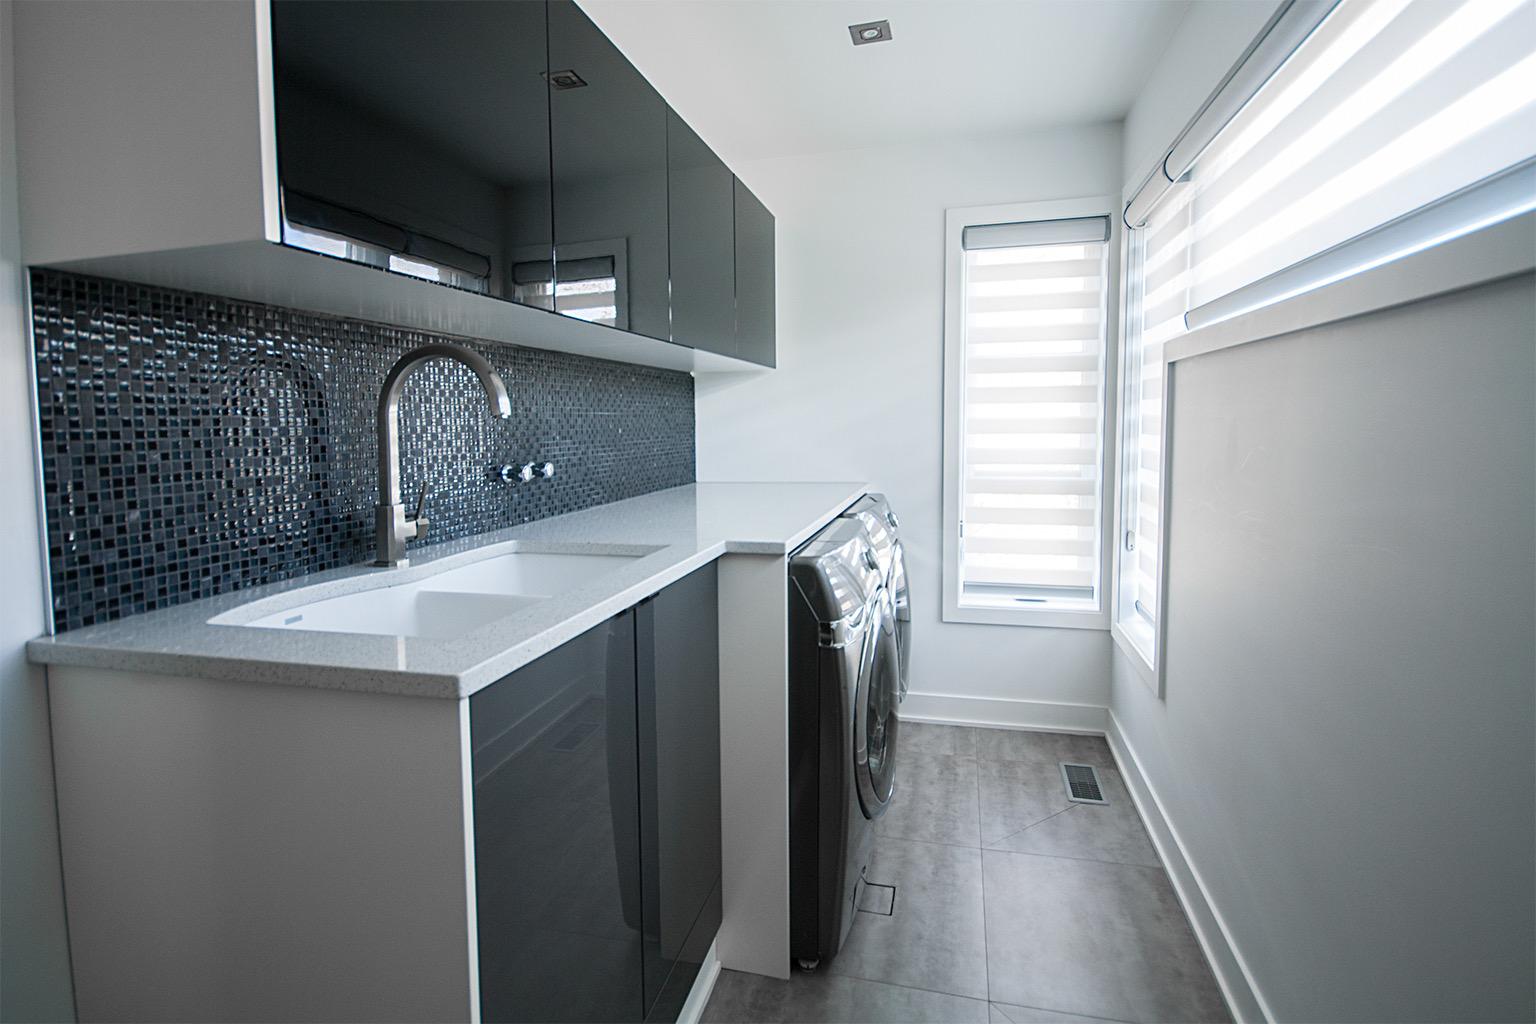 21_Laundry-Room.jpeg